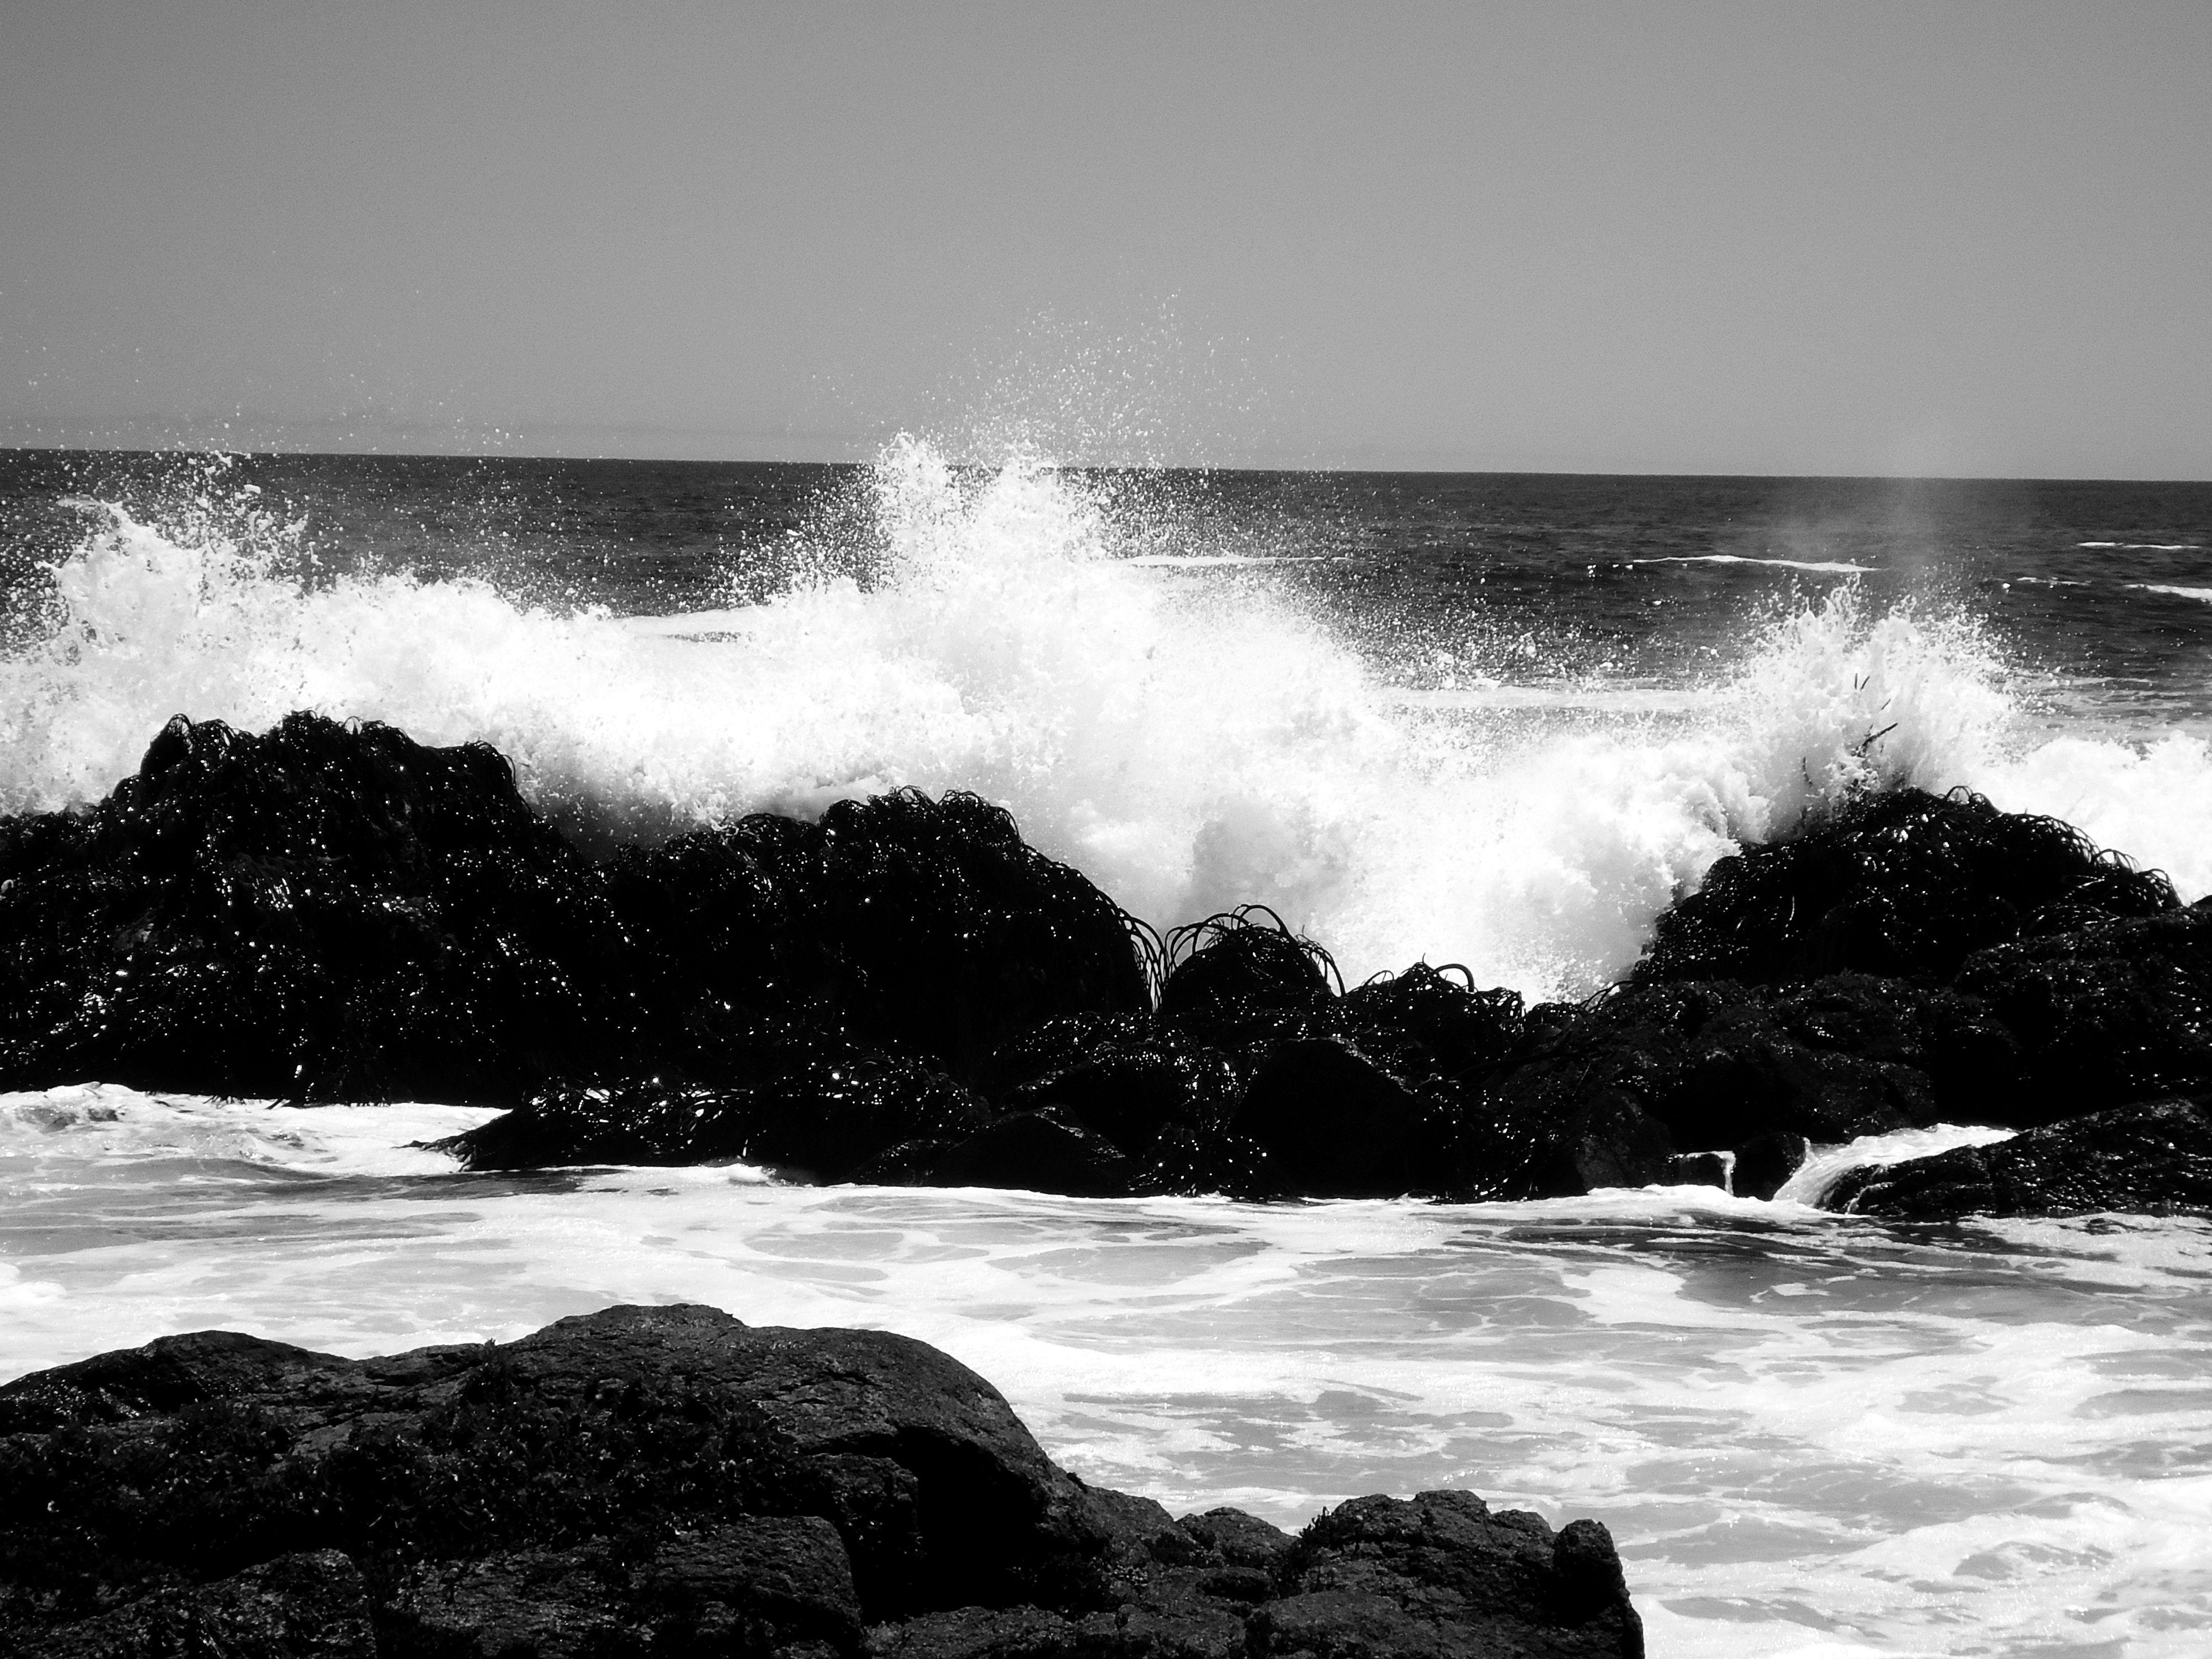 Black and white ocean waves sea rocks balance between black